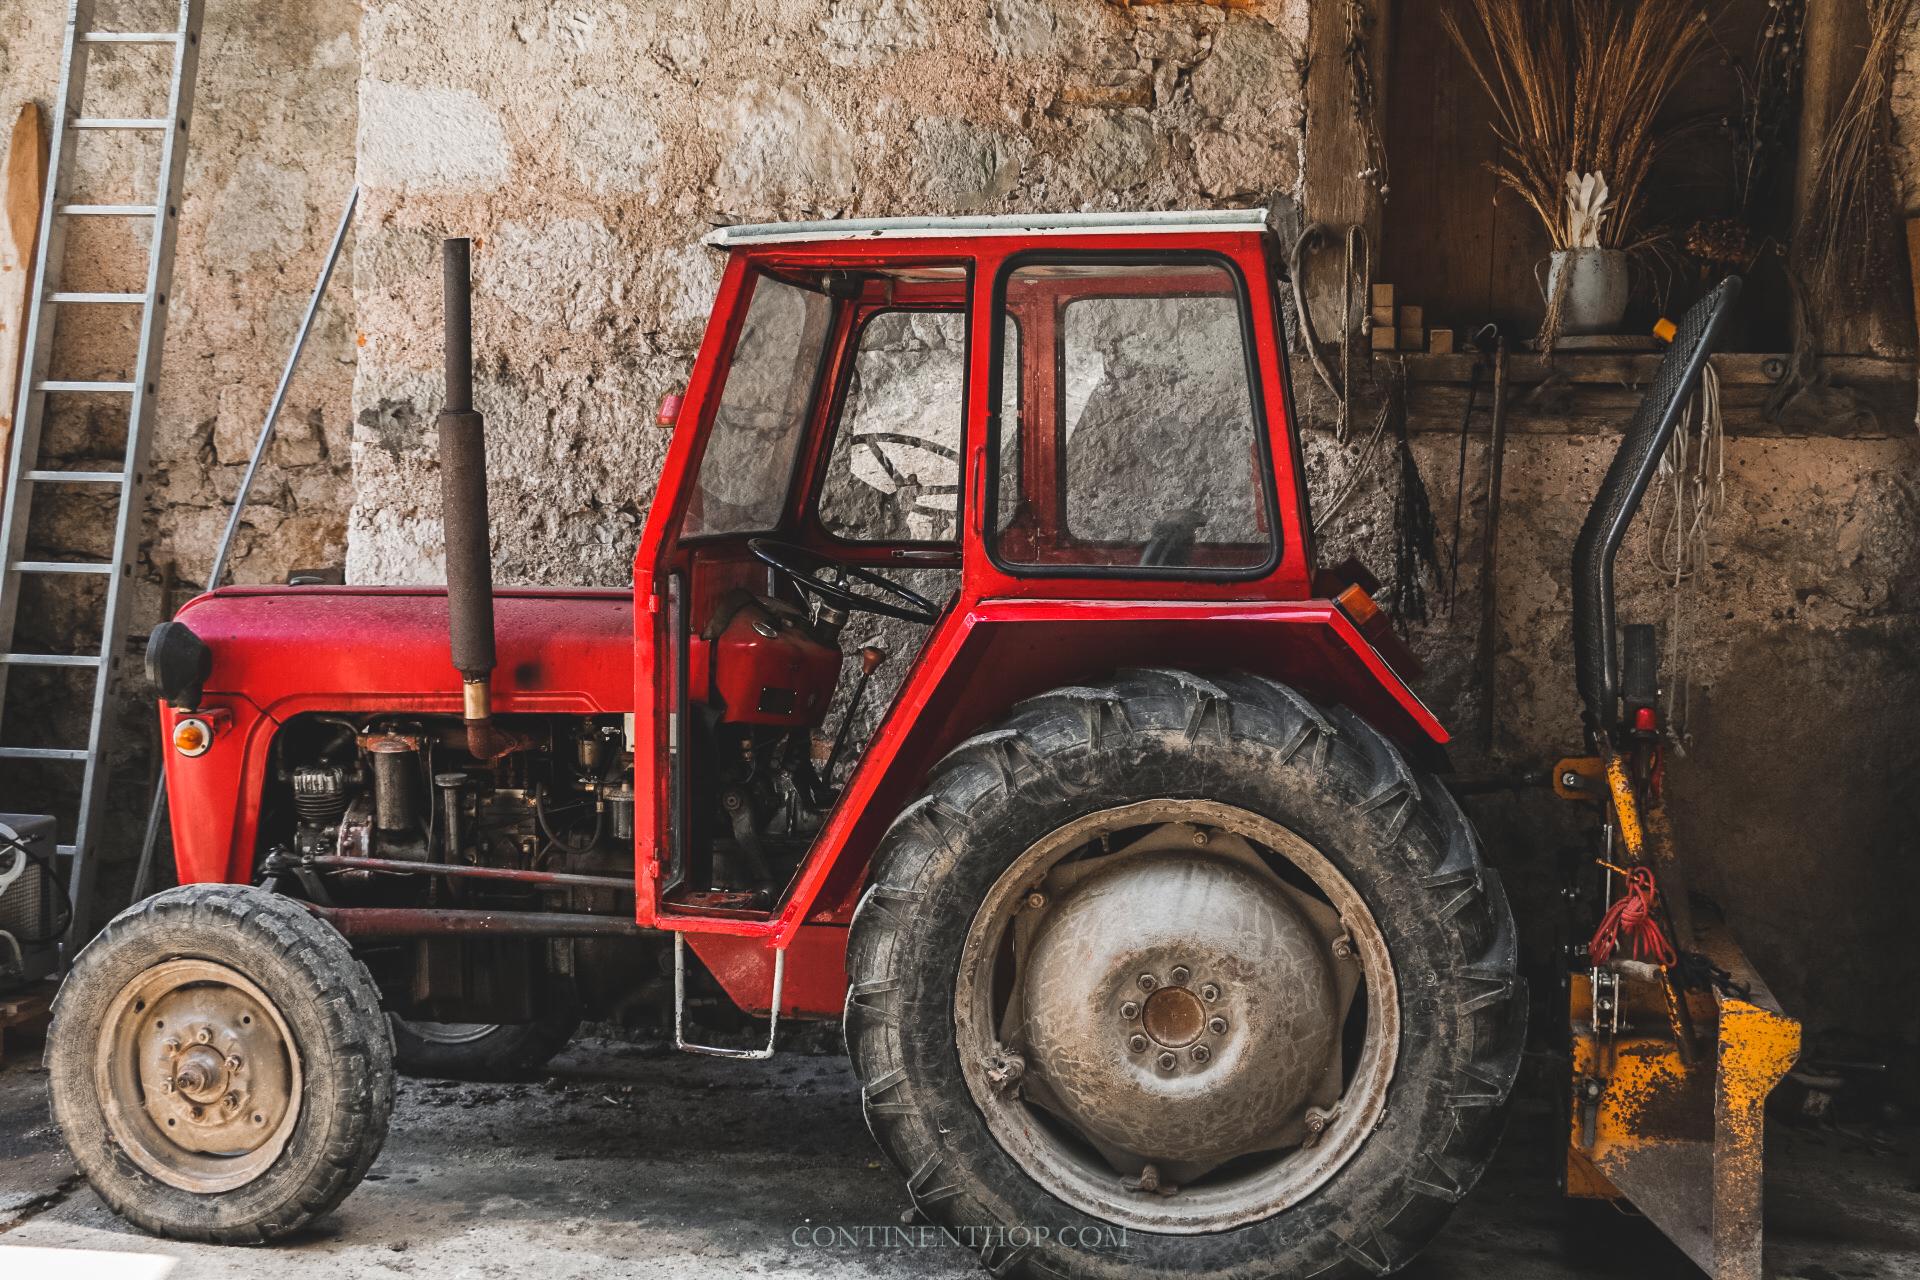 tractor at domacija kuzma excursion from big berry luxury glamping resort in bela krajina slovenia